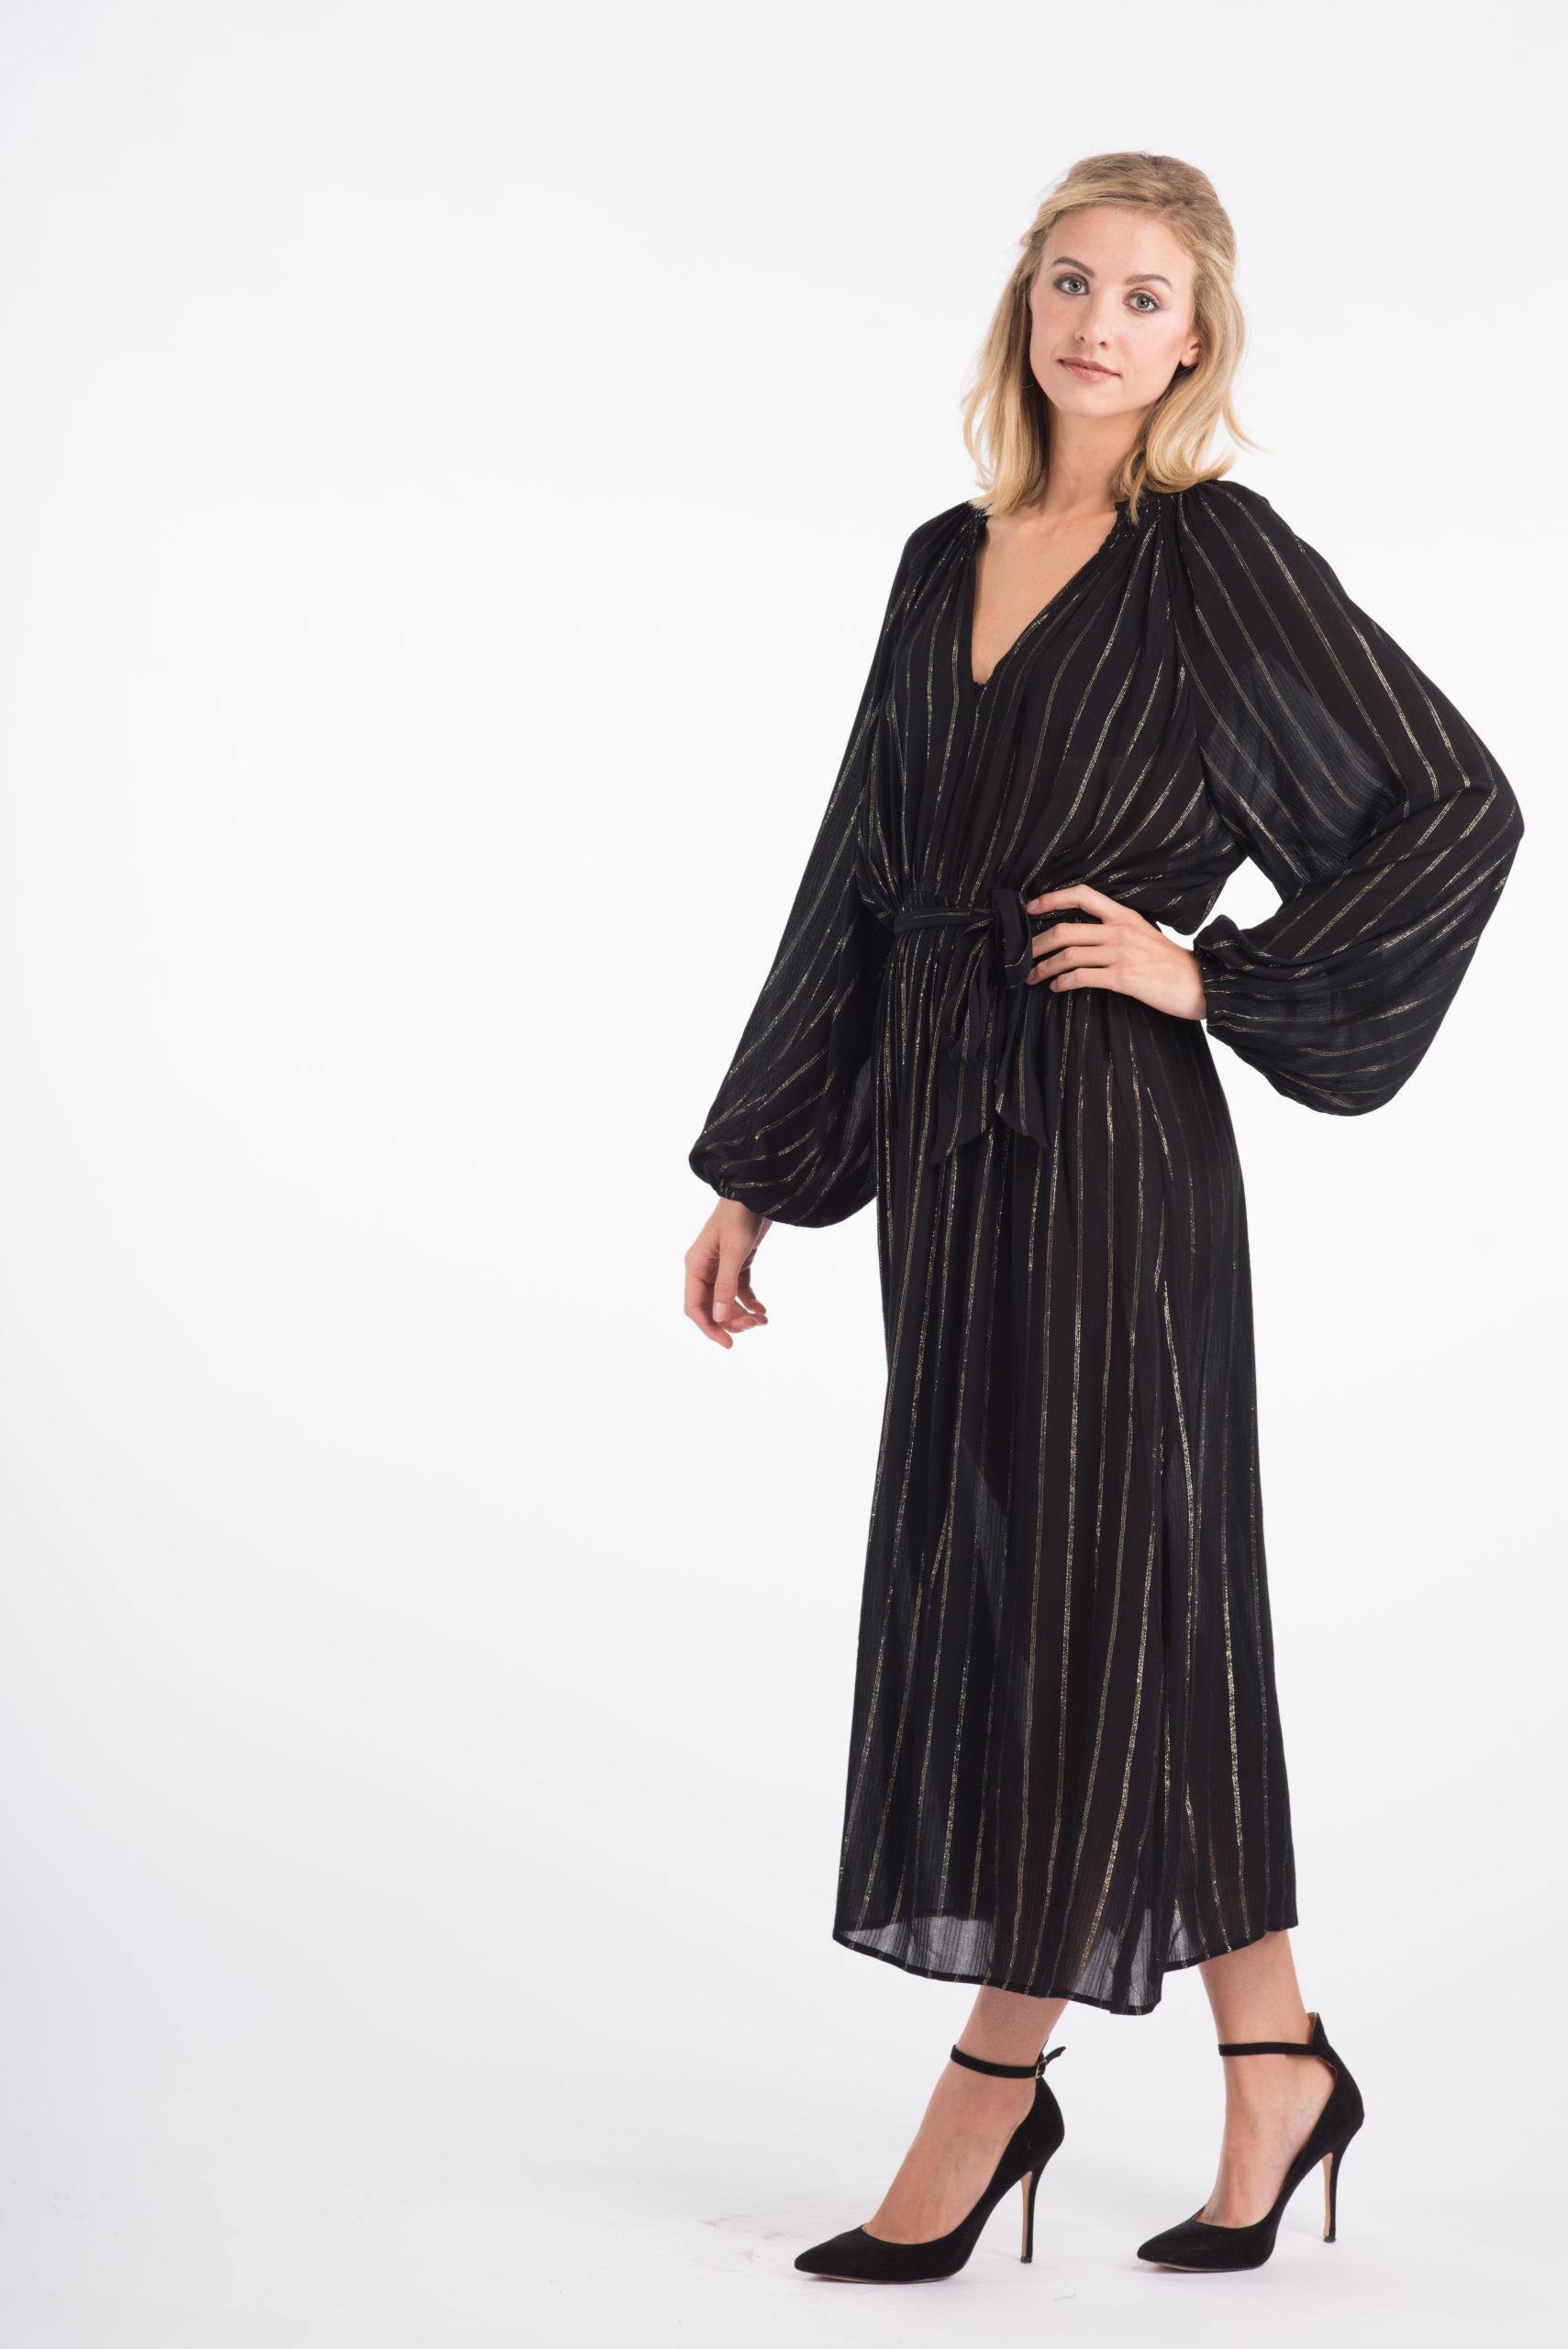 Feestelijke jurk Callous van Traffic People